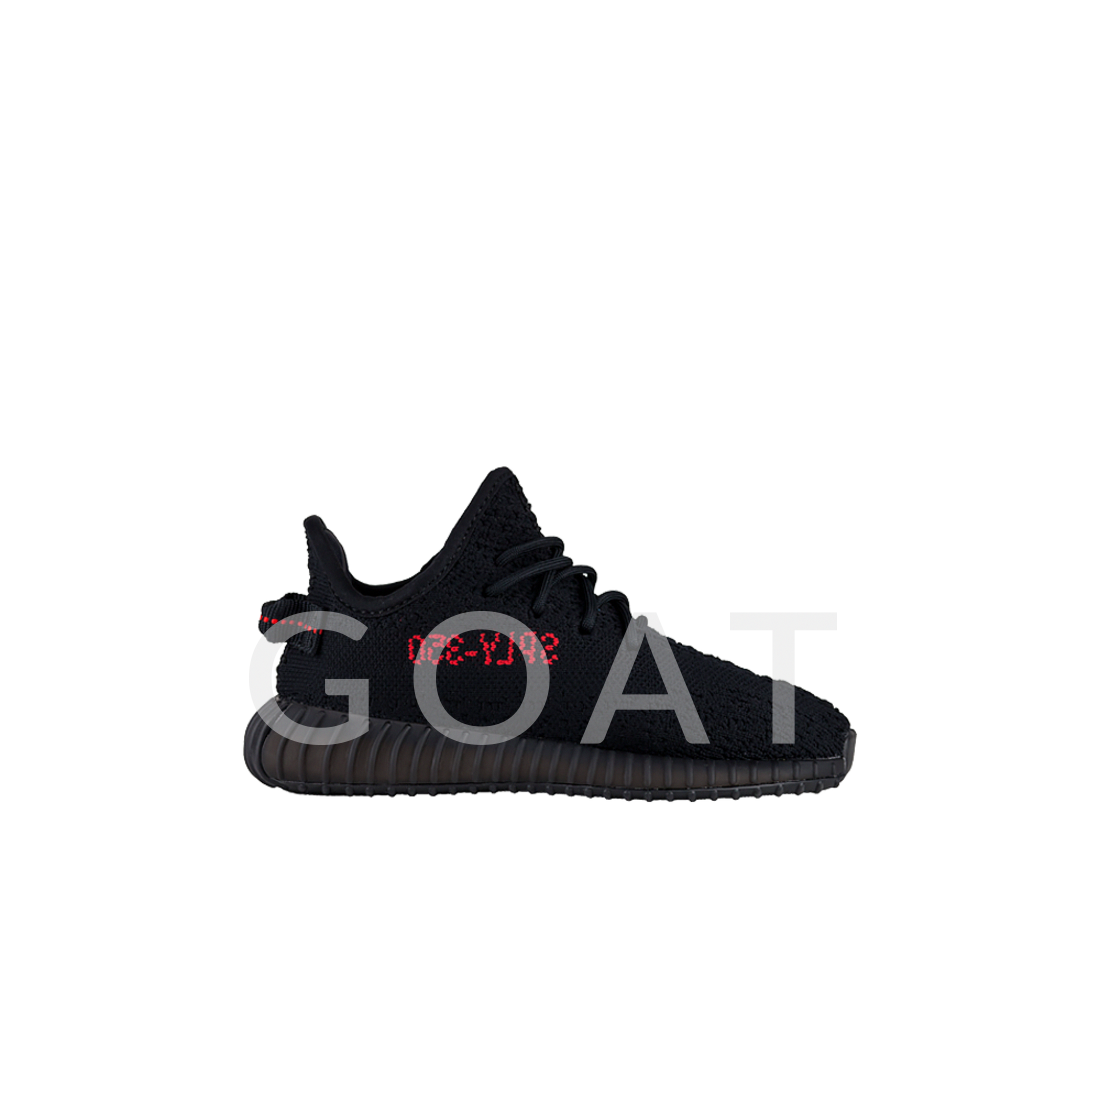 timeless design 3ca2c af2e7 Yeezy Boost 350 V2 Infant Bred - Adidas - BB6372 - core black core black